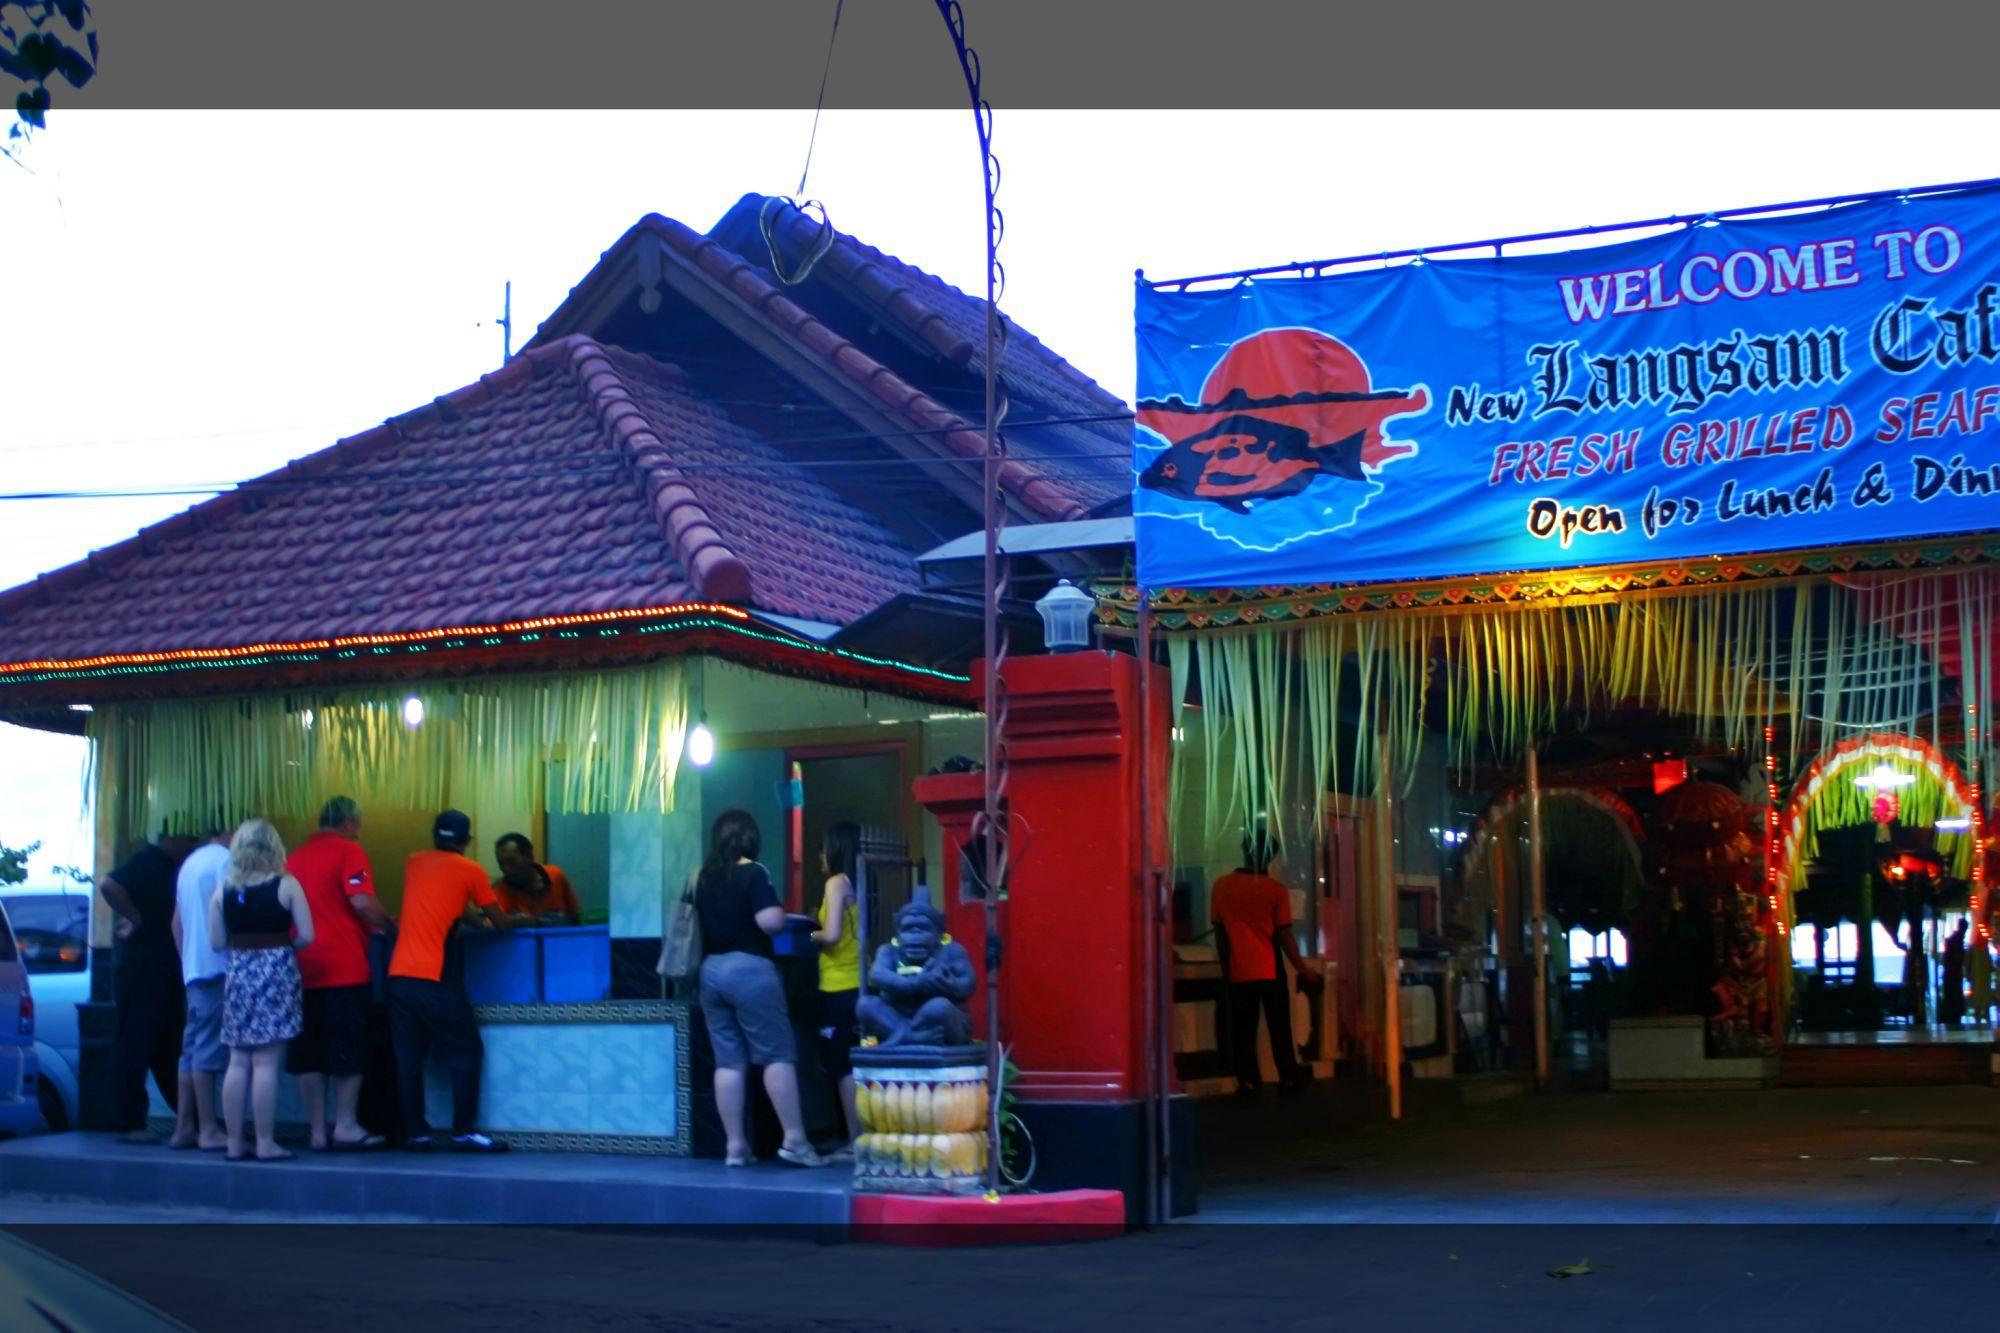 New Langsam's Cafe